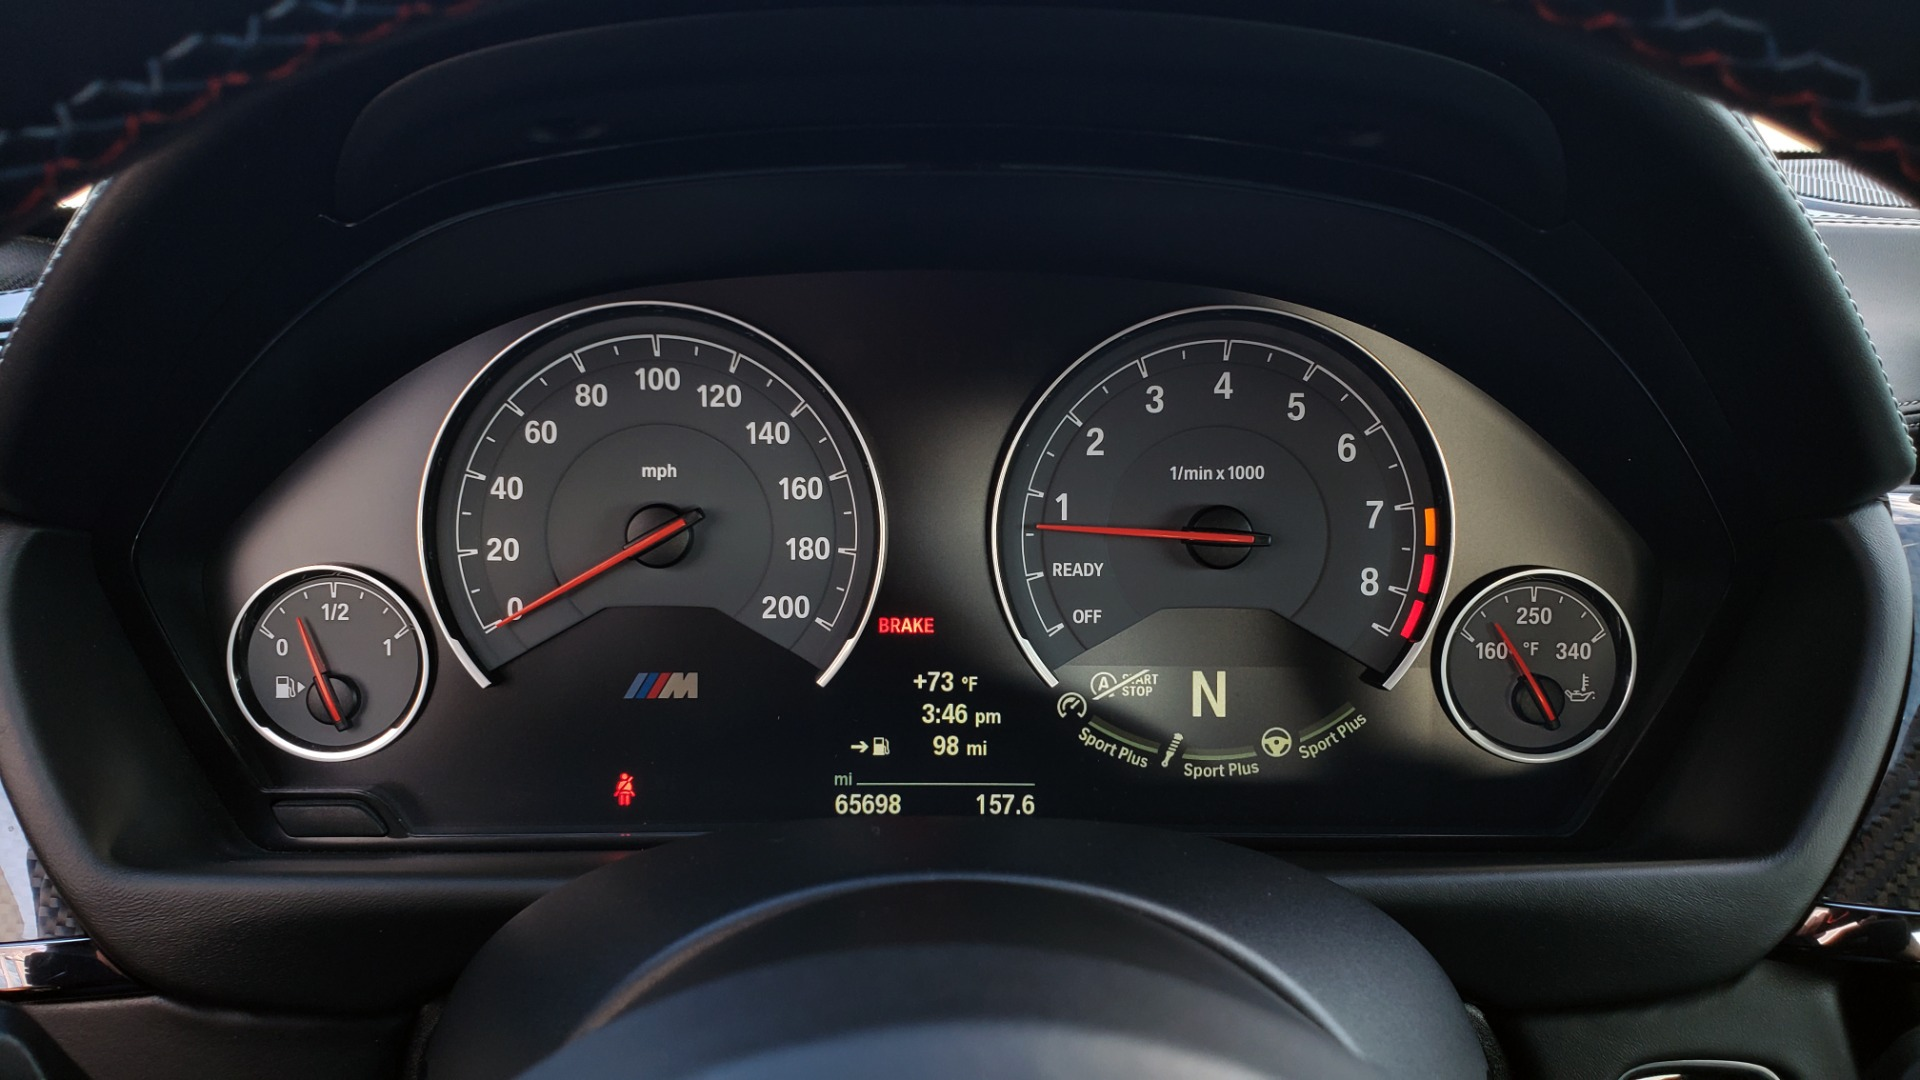 Used 2015 BMW M4 COUPE / EXEC PKG / DRVR ASST PLUS / LIGHTING / M-SUSPENSION for sale Sold at Formula Imports in Charlotte NC 28227 50